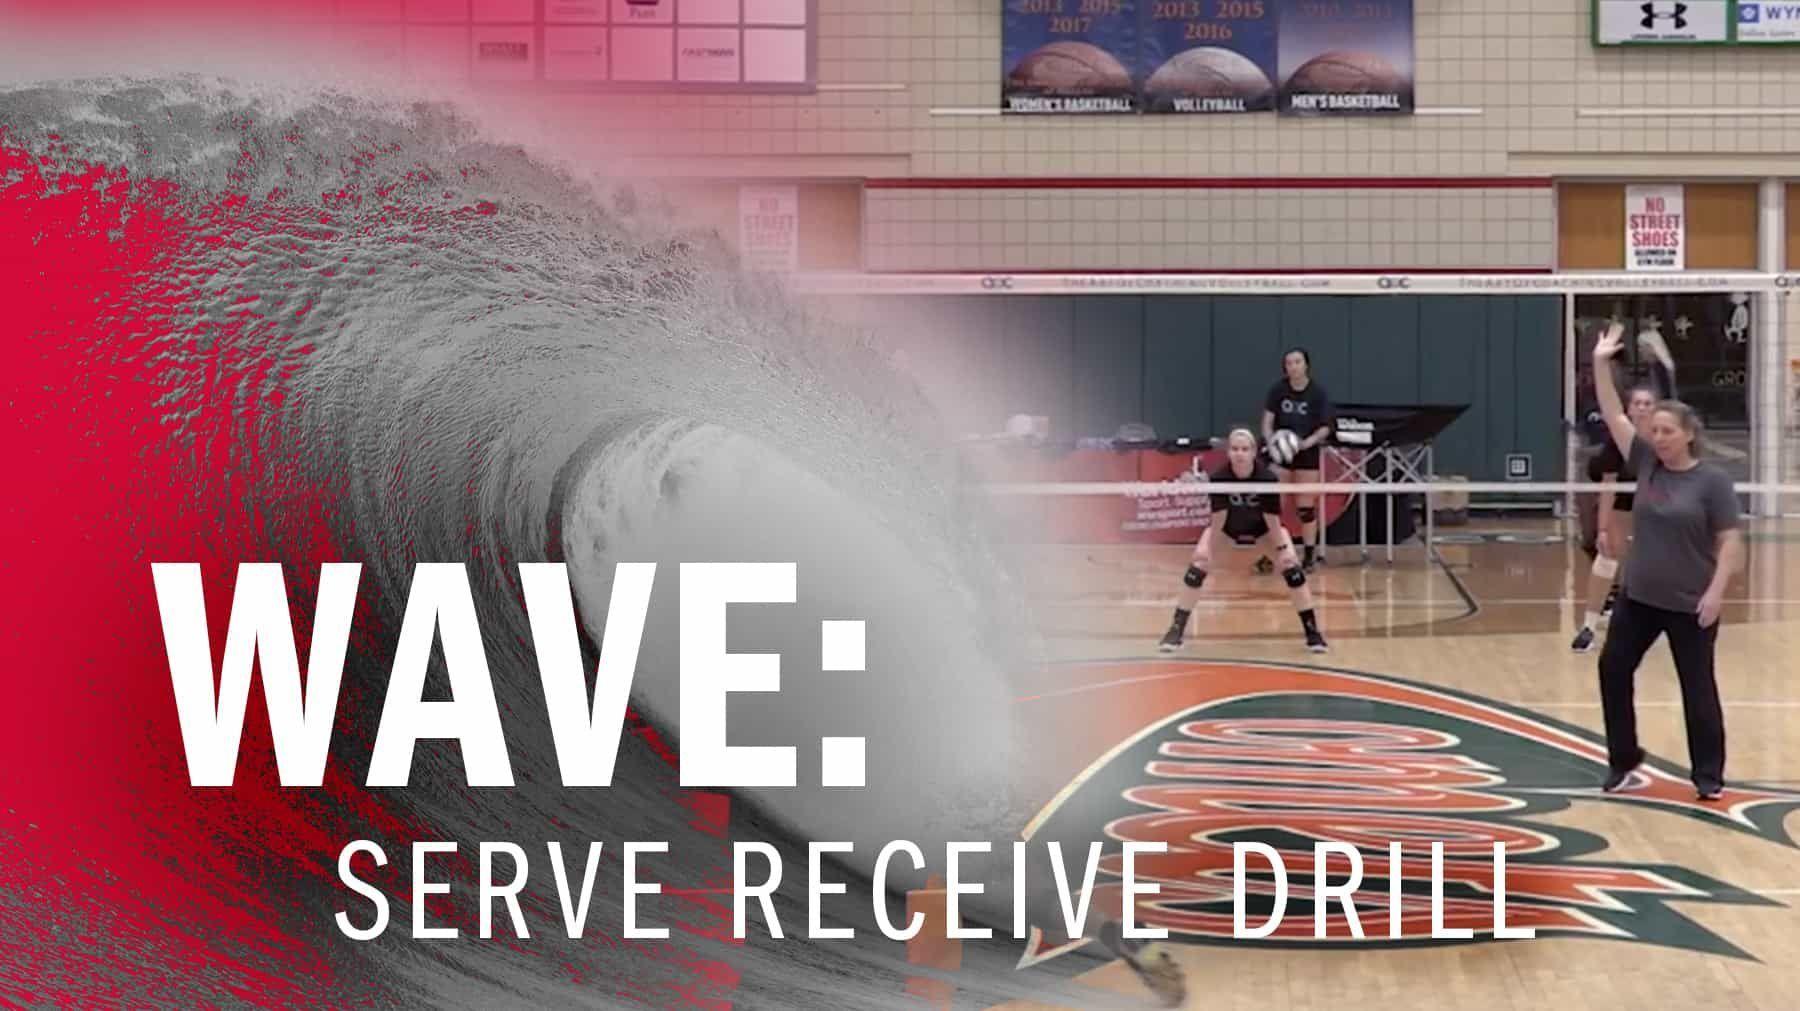 Wave Serve Receive Drill Volleyball Drills Coaching Volleyball Volleyball Serve